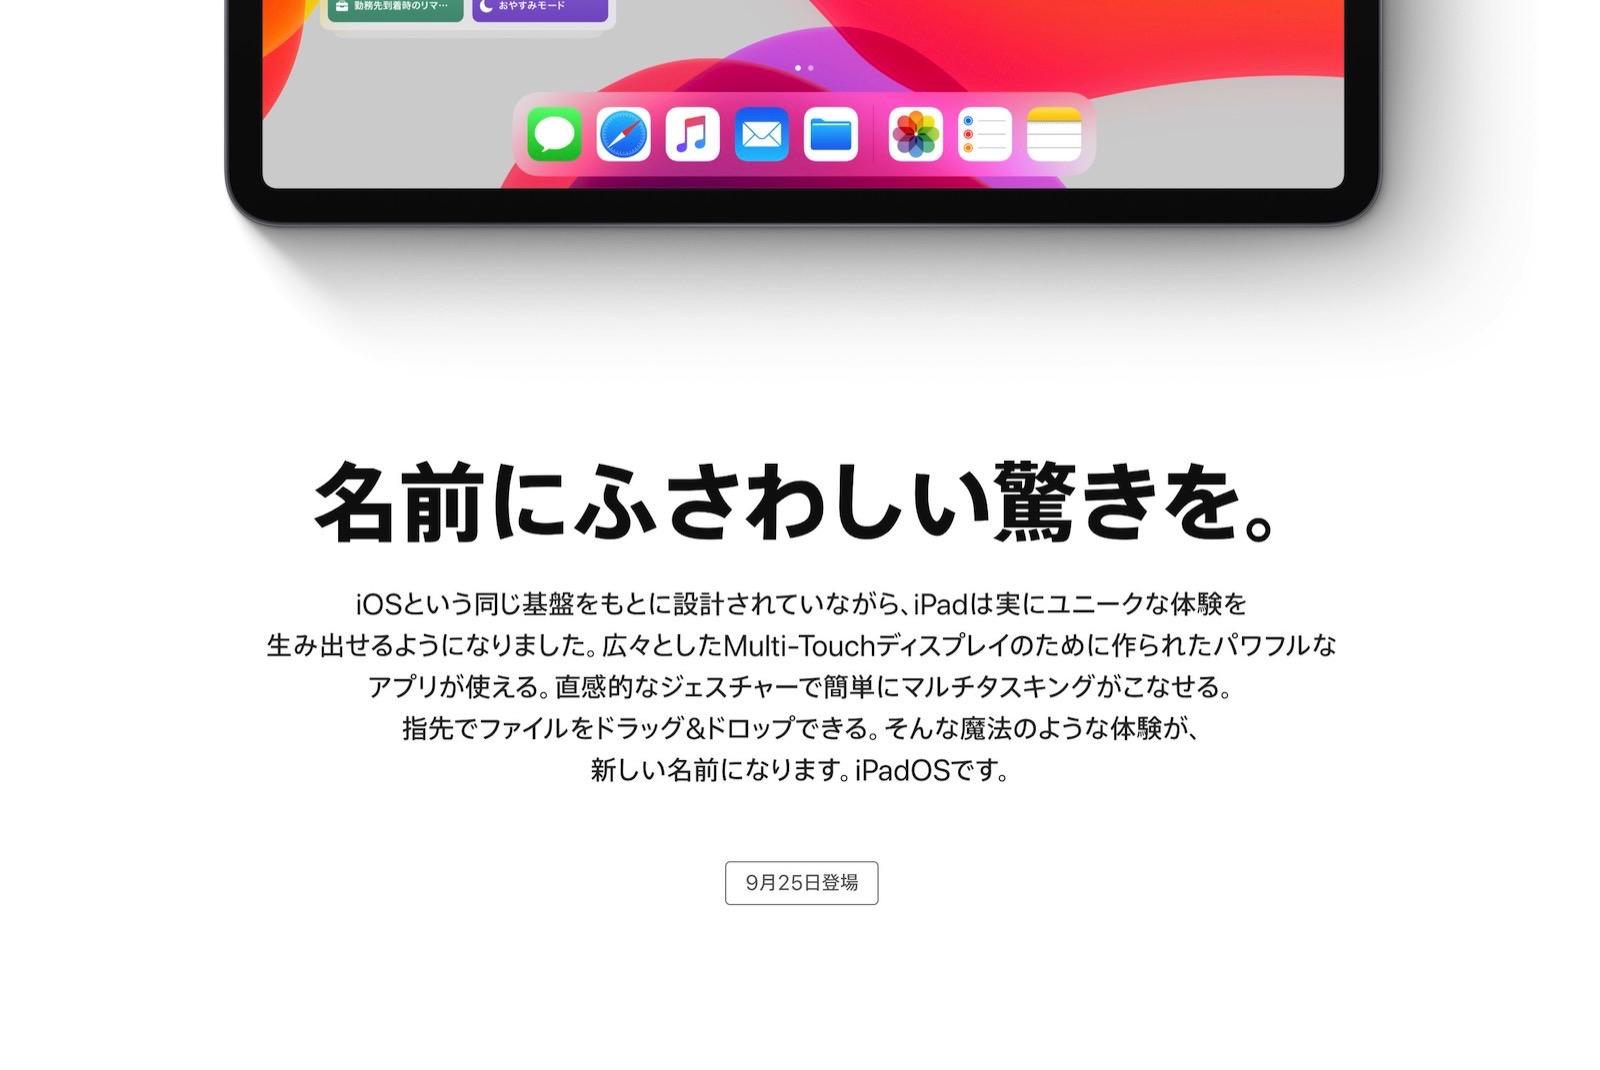 ipados-release-date.jpg